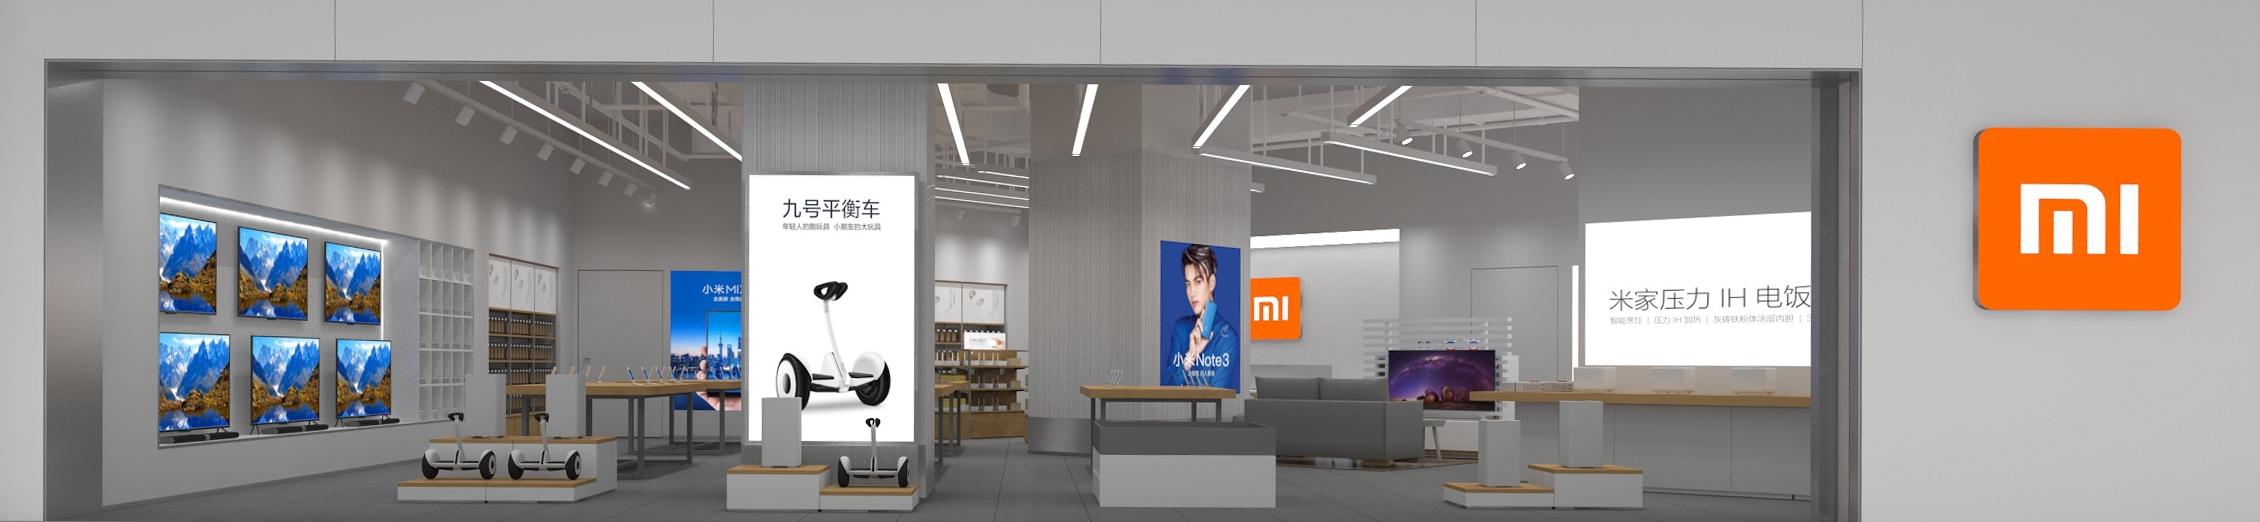 XiaoMi-home